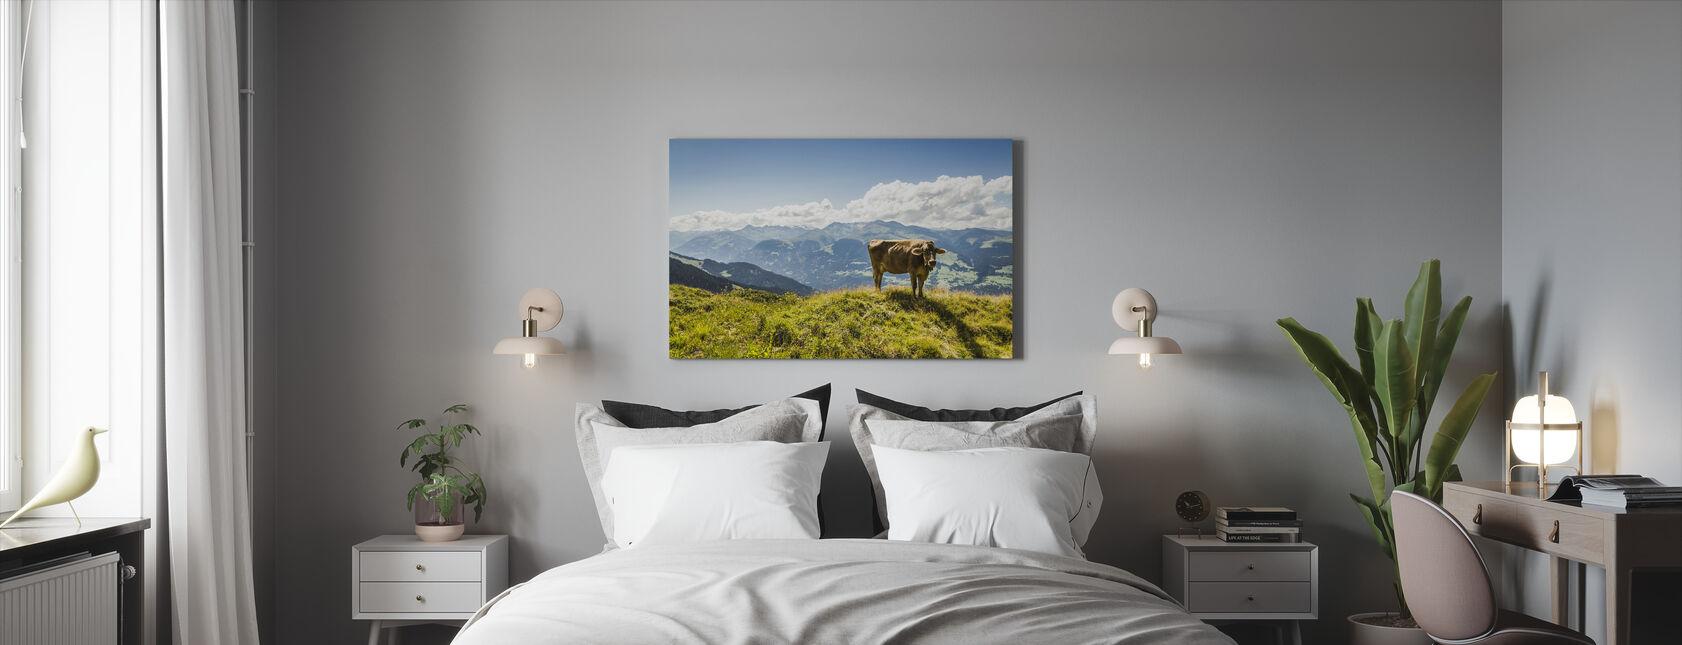 Cow Grazing on Grassy Hillside - Canvas print - Bedroom